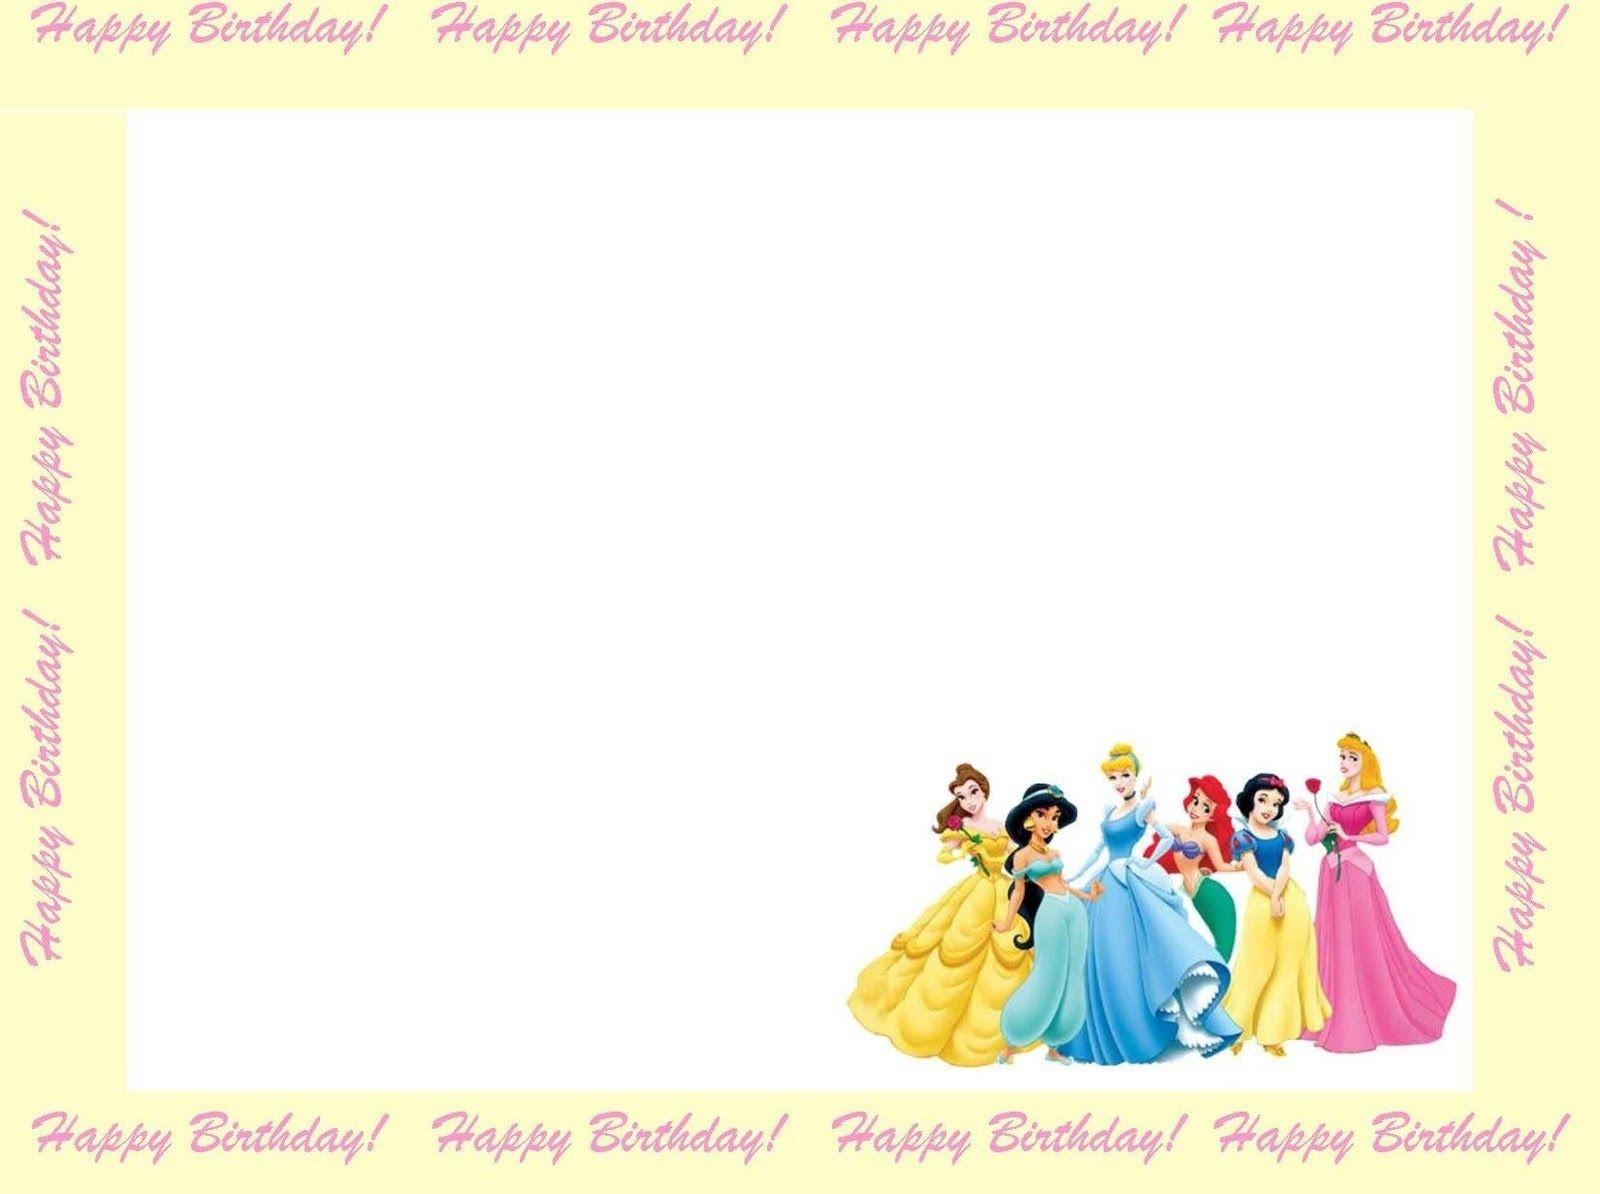 Free Princess Invitations To Print | Free Printable Disney Princess - Free Printable Princess Invitation Cards